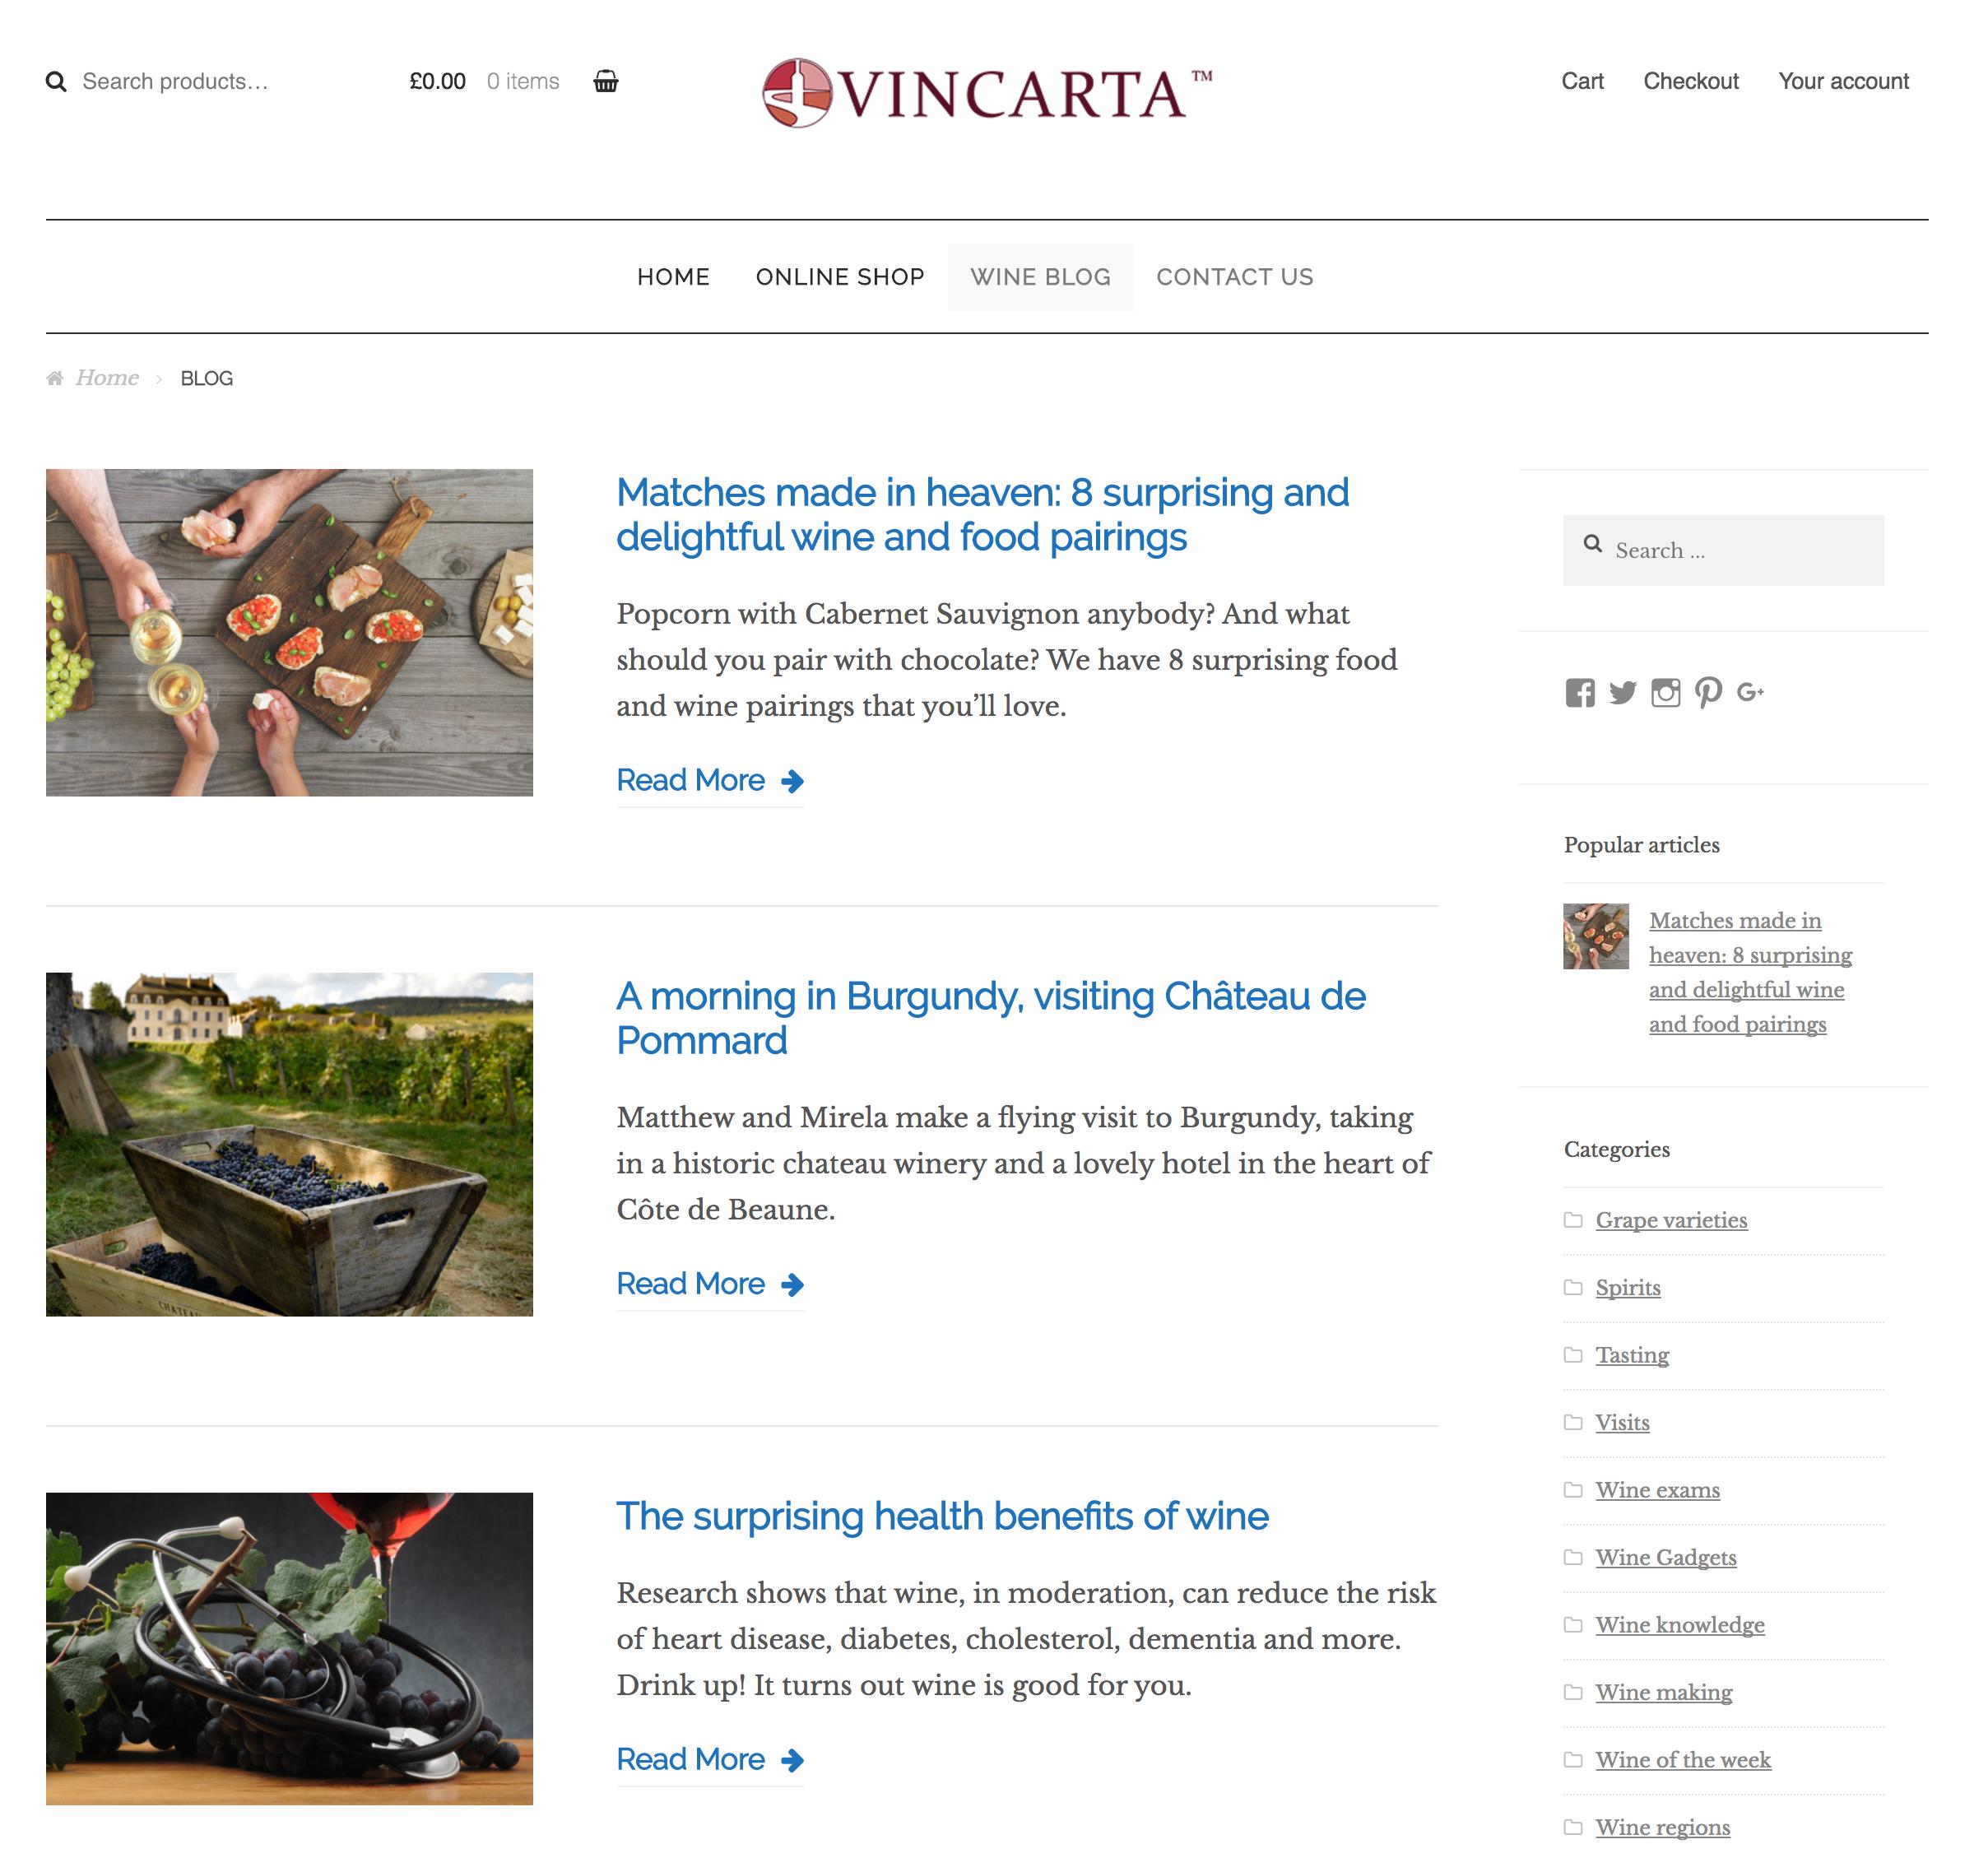 Vincarta wine website screenshot